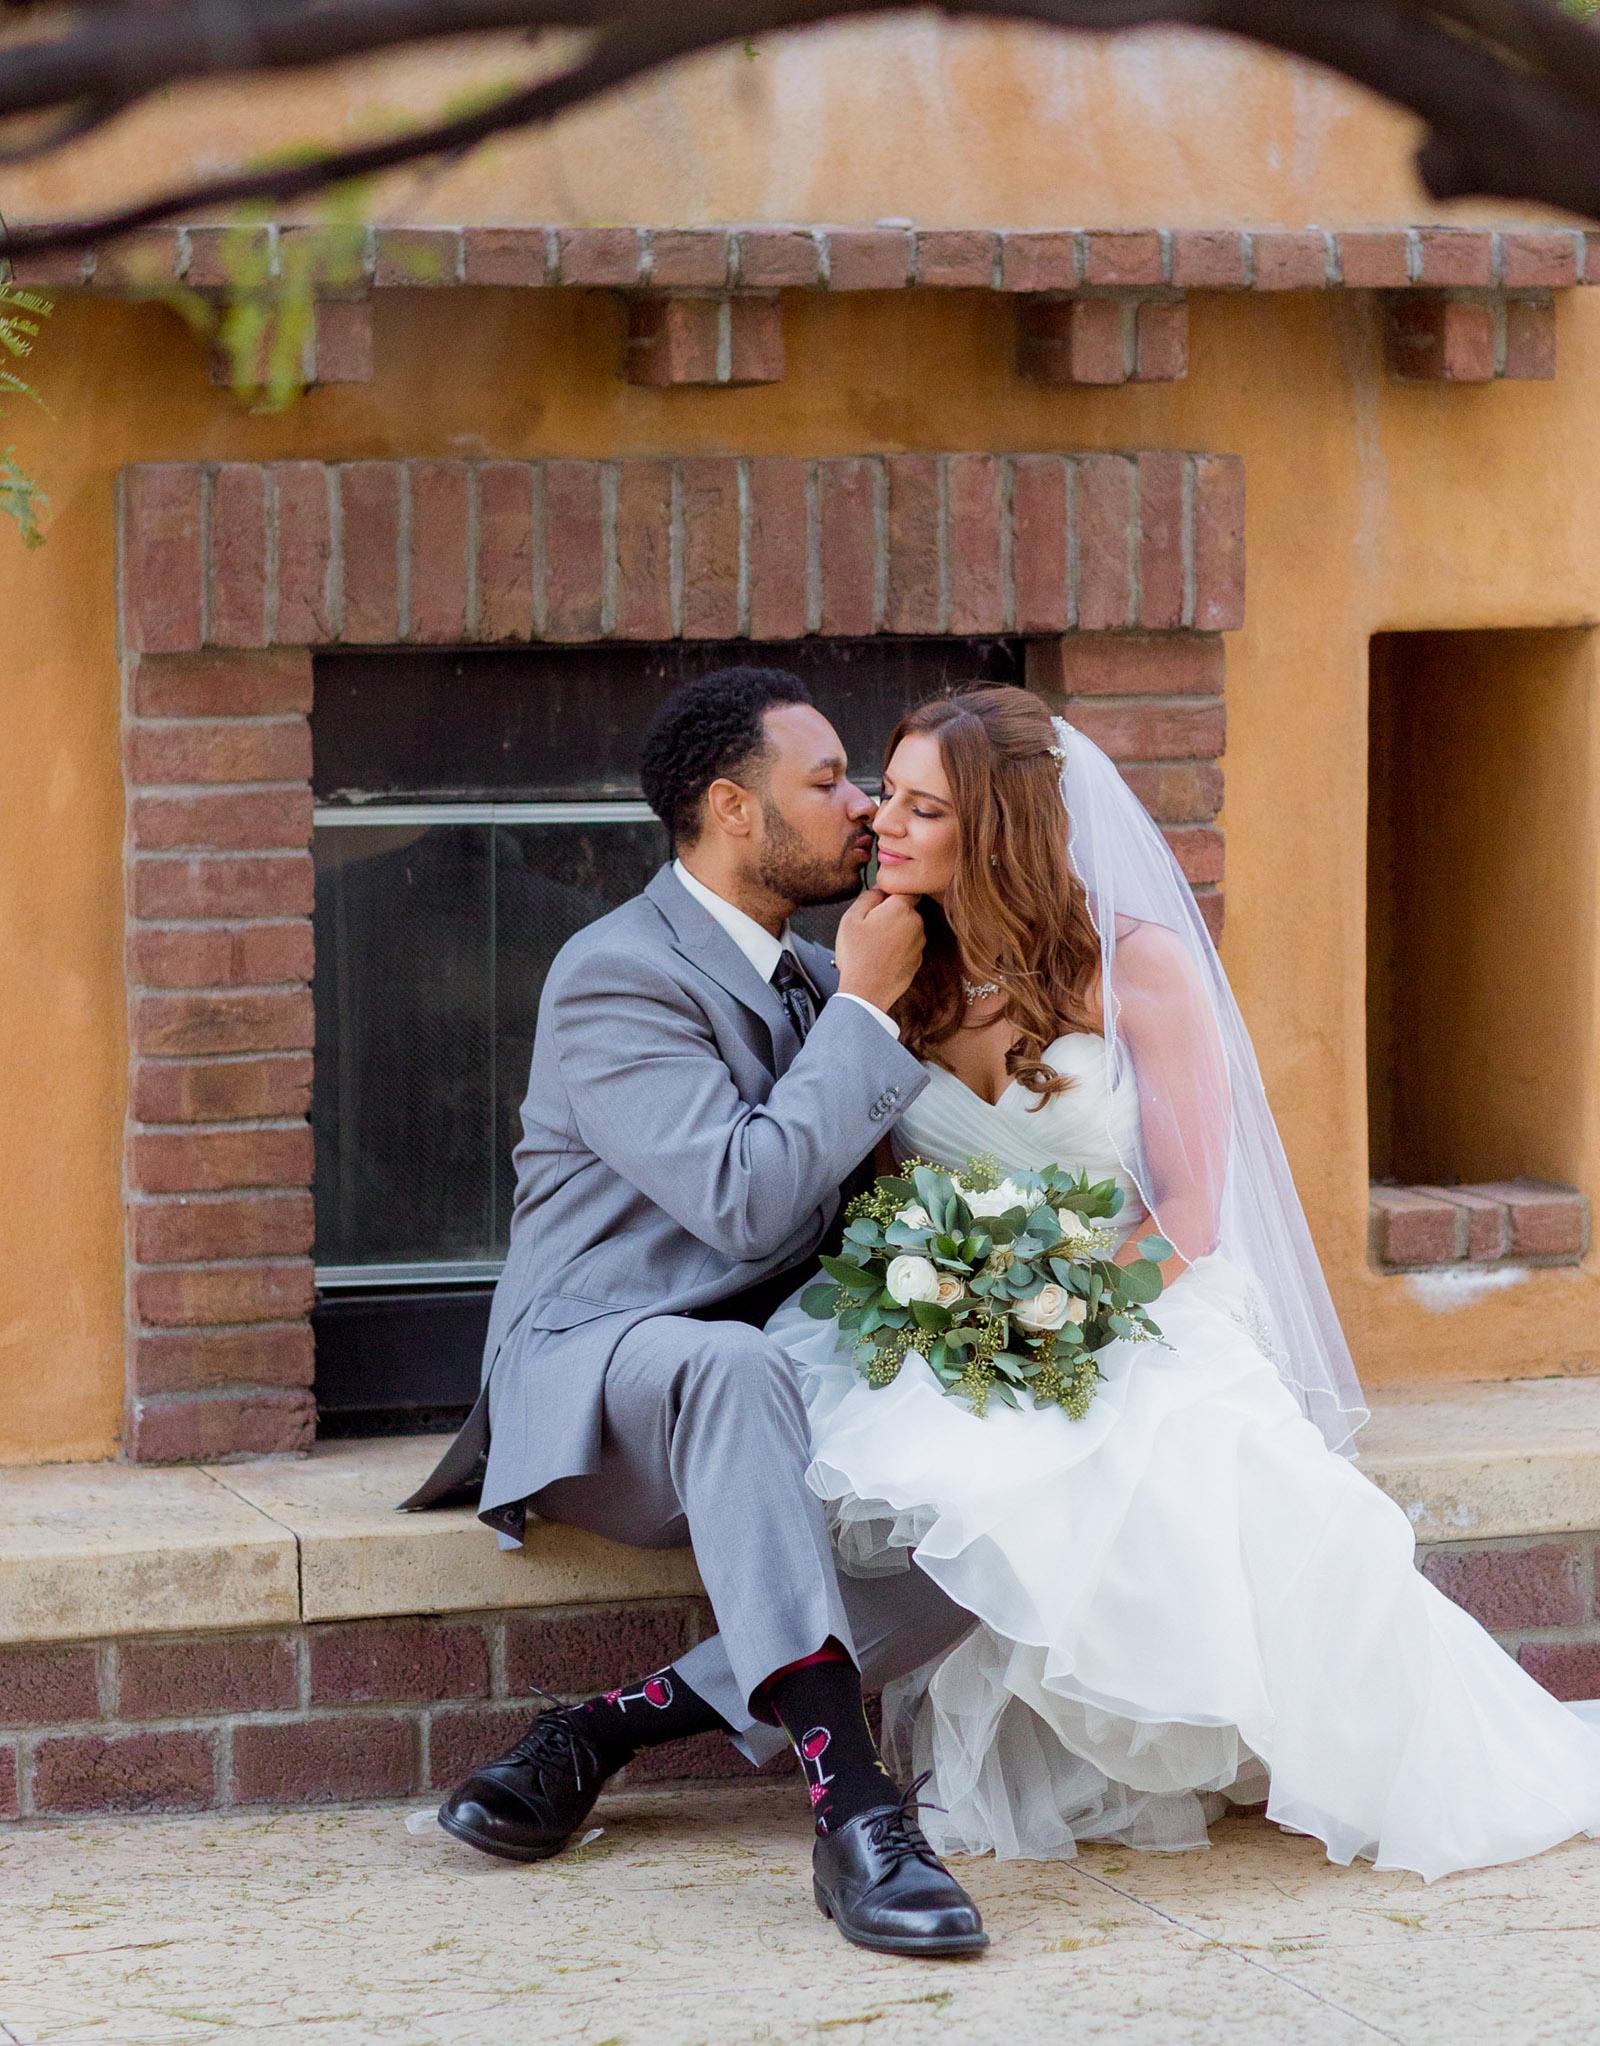 Bride & groom by fireplace - The Retreat - Corona, California - Riverside County - Wedgewood Weddings